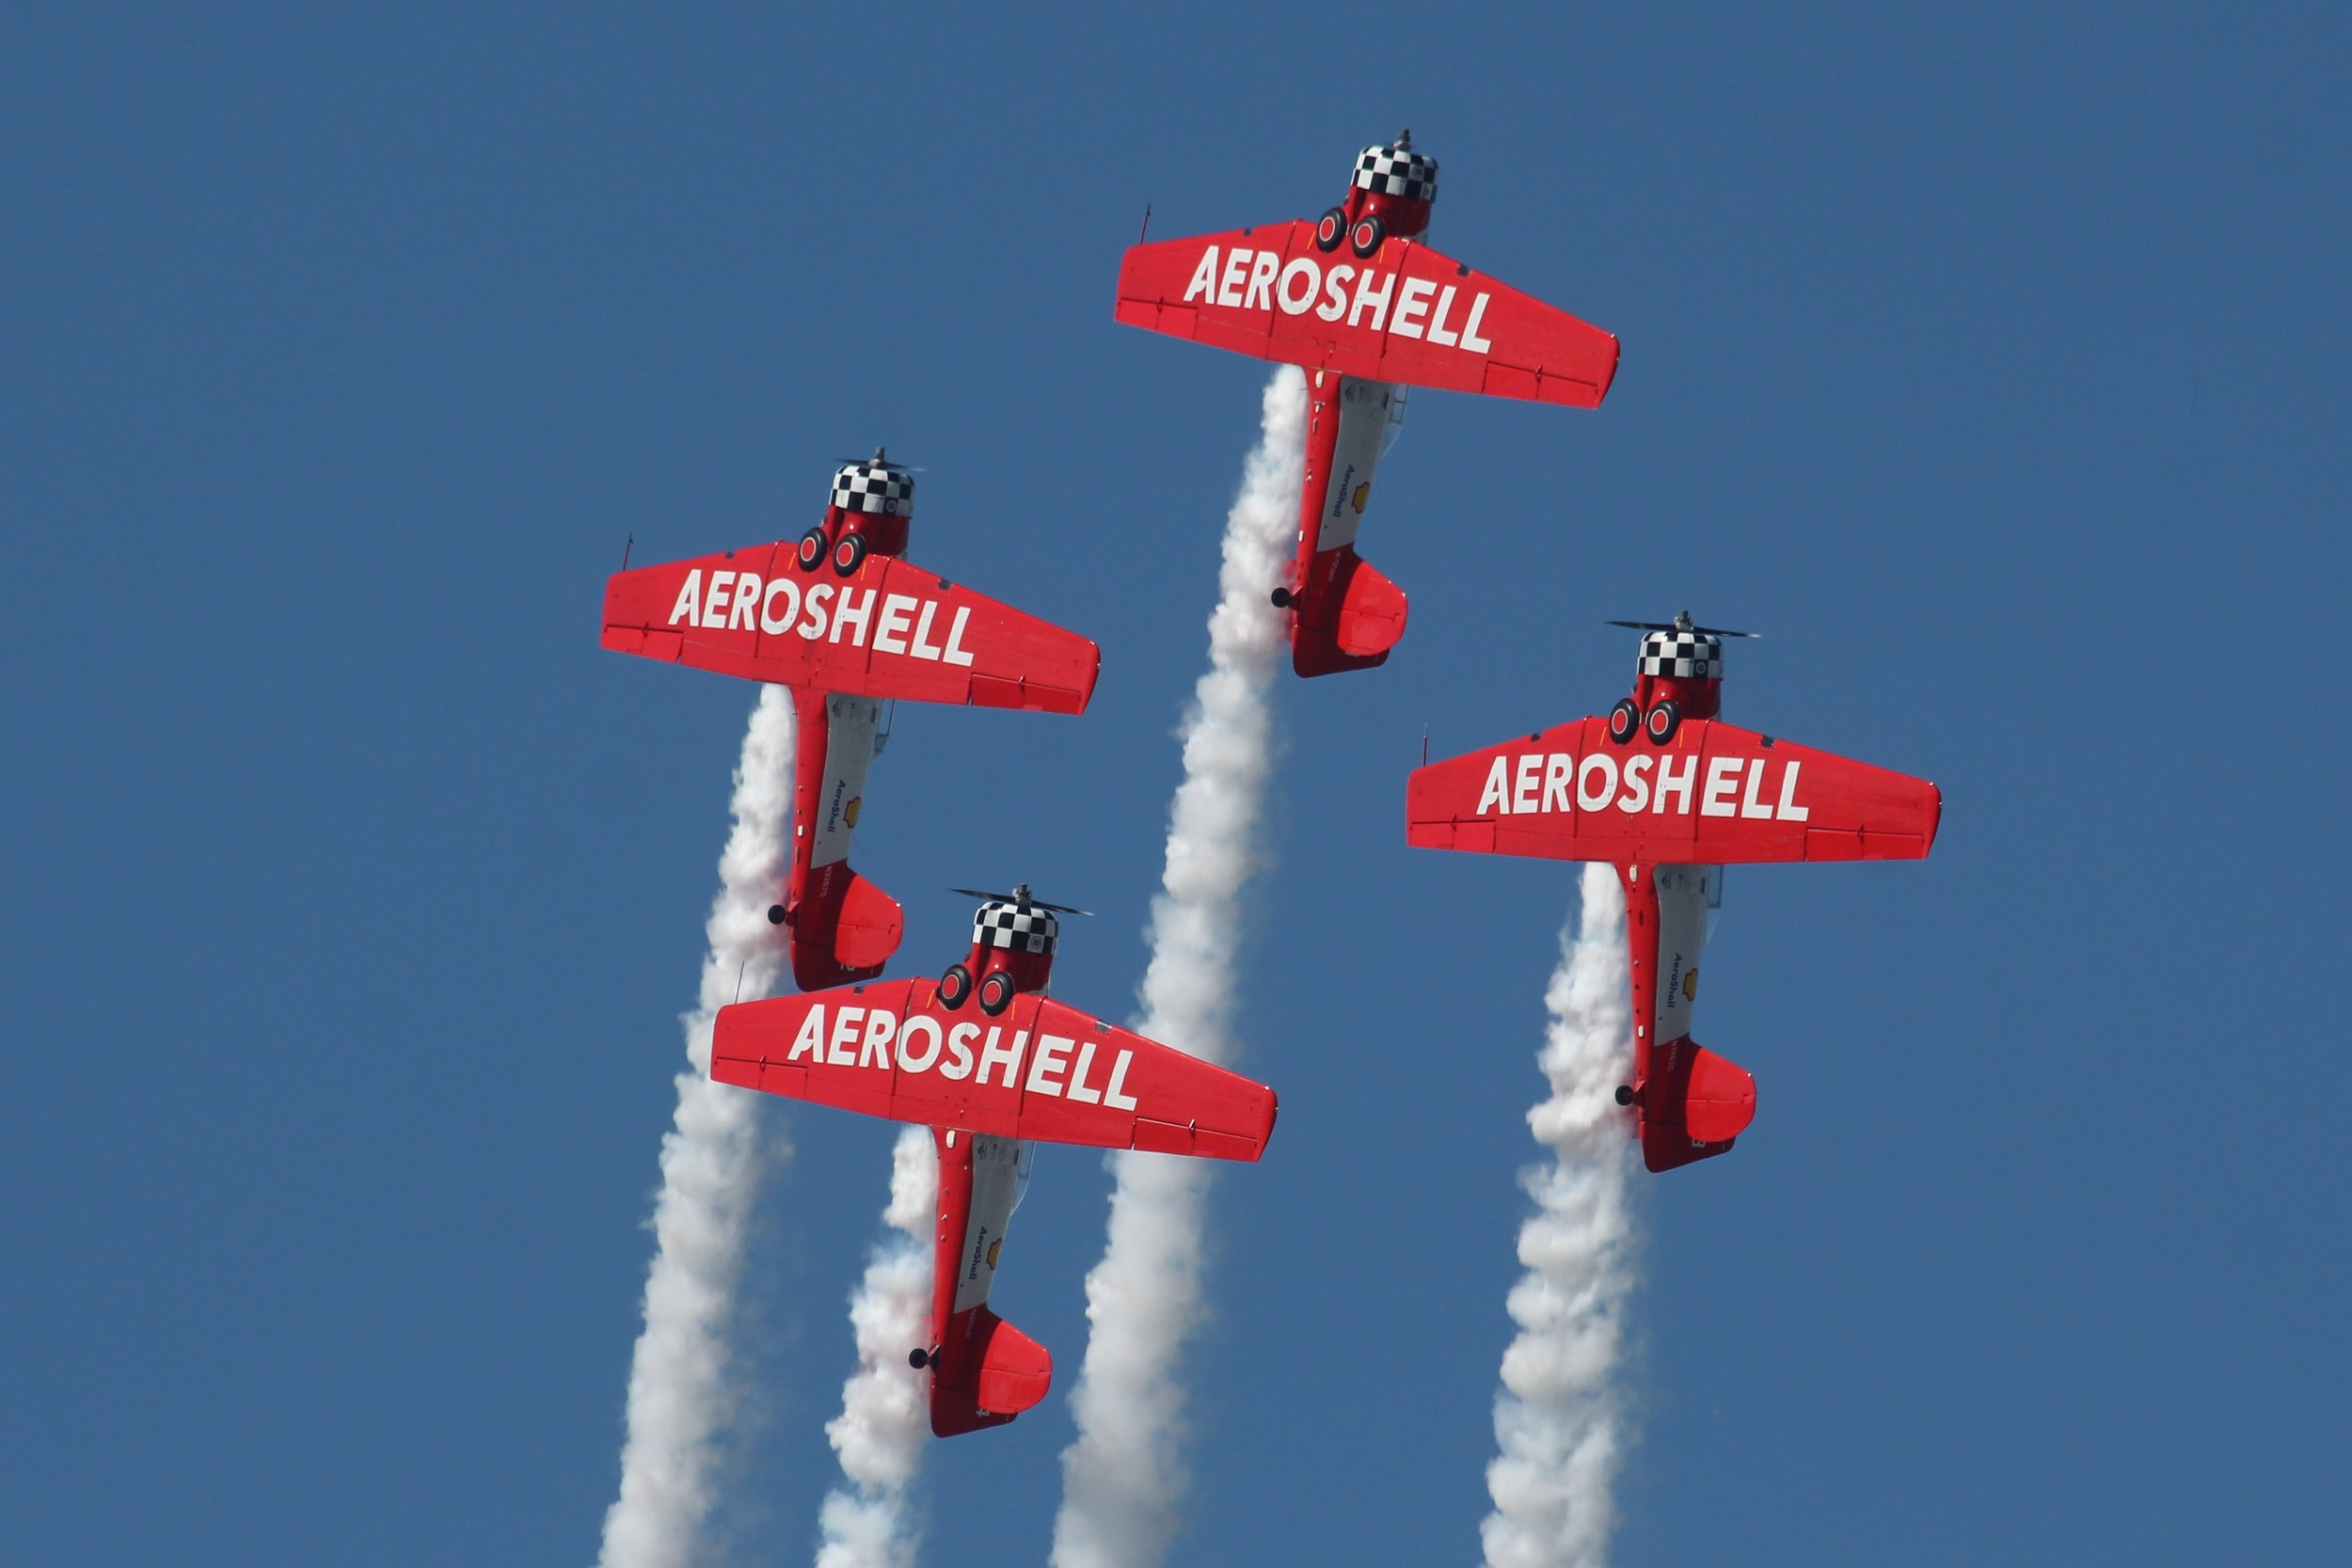 Aeroshell Aerobatic display team flying T-6 Texan's displaying at Oshkosh 25th July 2018 taken by Andrew Tenny